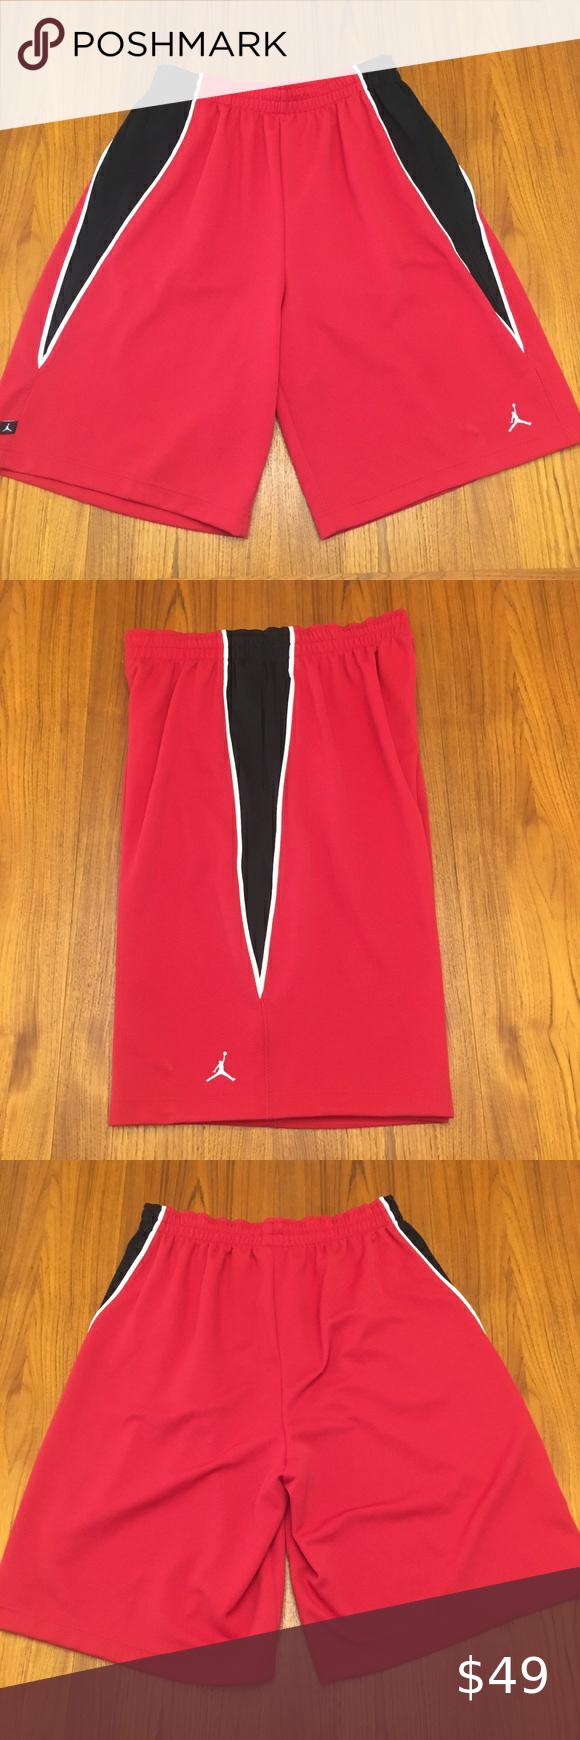 Sold Vintage Nike Air Jordan Shorts Xl 2007 In 2020 Nike Air Jordan Jordan Shorts Air Jordans